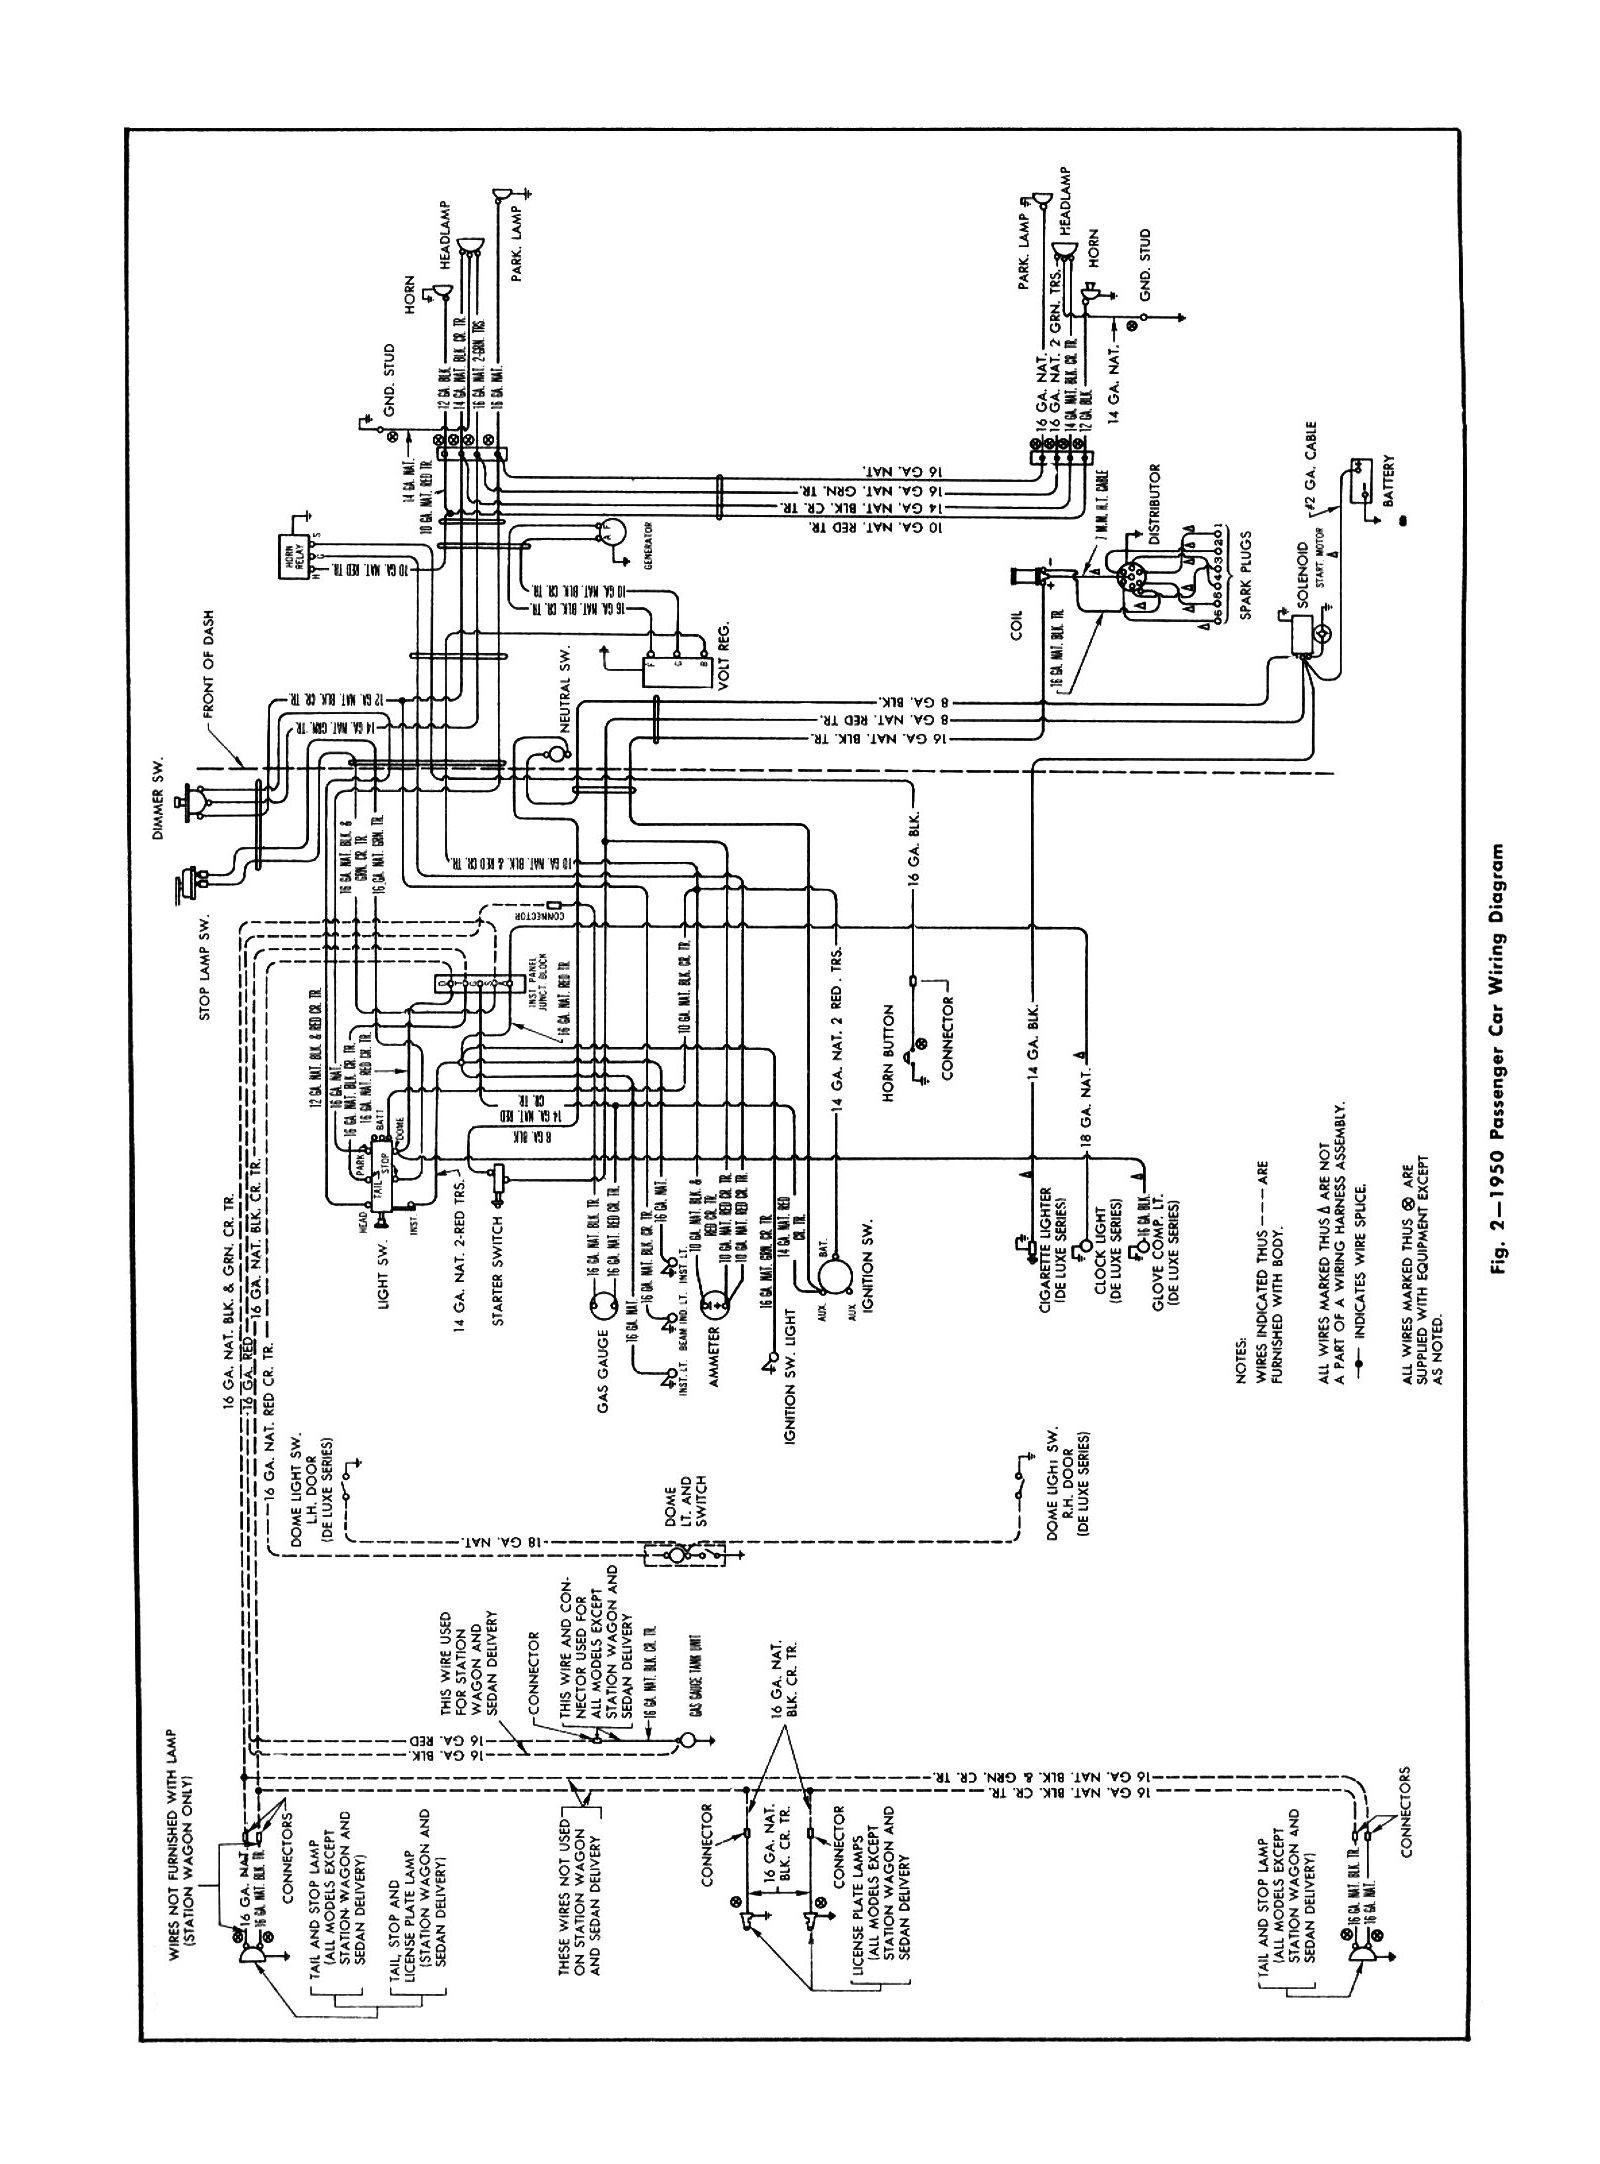 [SCHEMATICS_48ZD]  BM_1435] Wiring Diagram For The 1950 Chevrolet Passenger Cars Car Pictures Free  Diagram   Free Chevrolet Wiring Diagram      Benkeme Verr Ponol Rous Shopa Mohammedshrine Librar Wiring 101